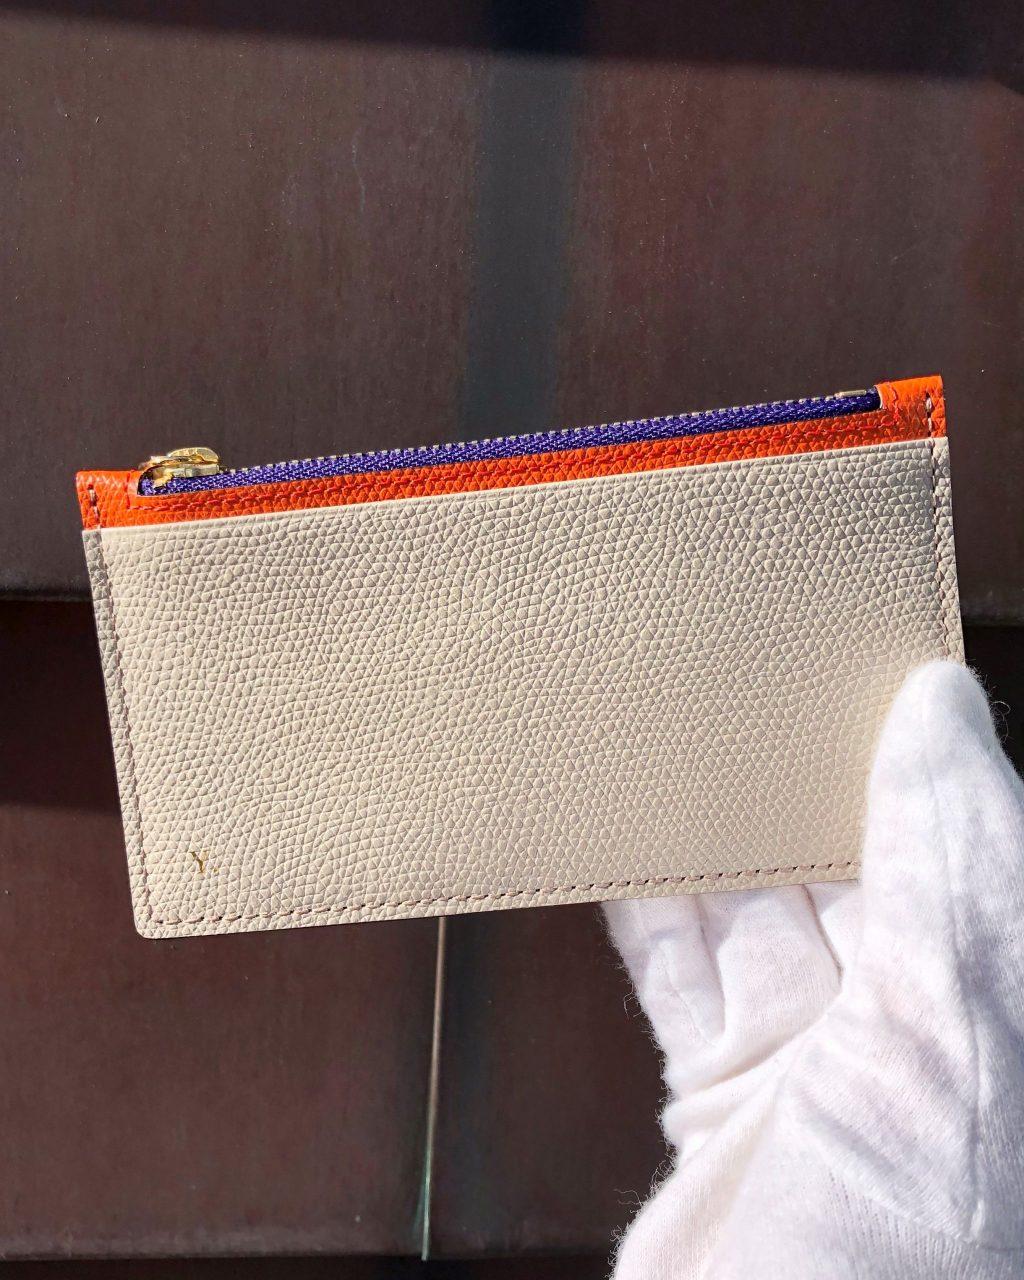 【Epoi本店】12月・1月のセミオーダーお財布をご紹介